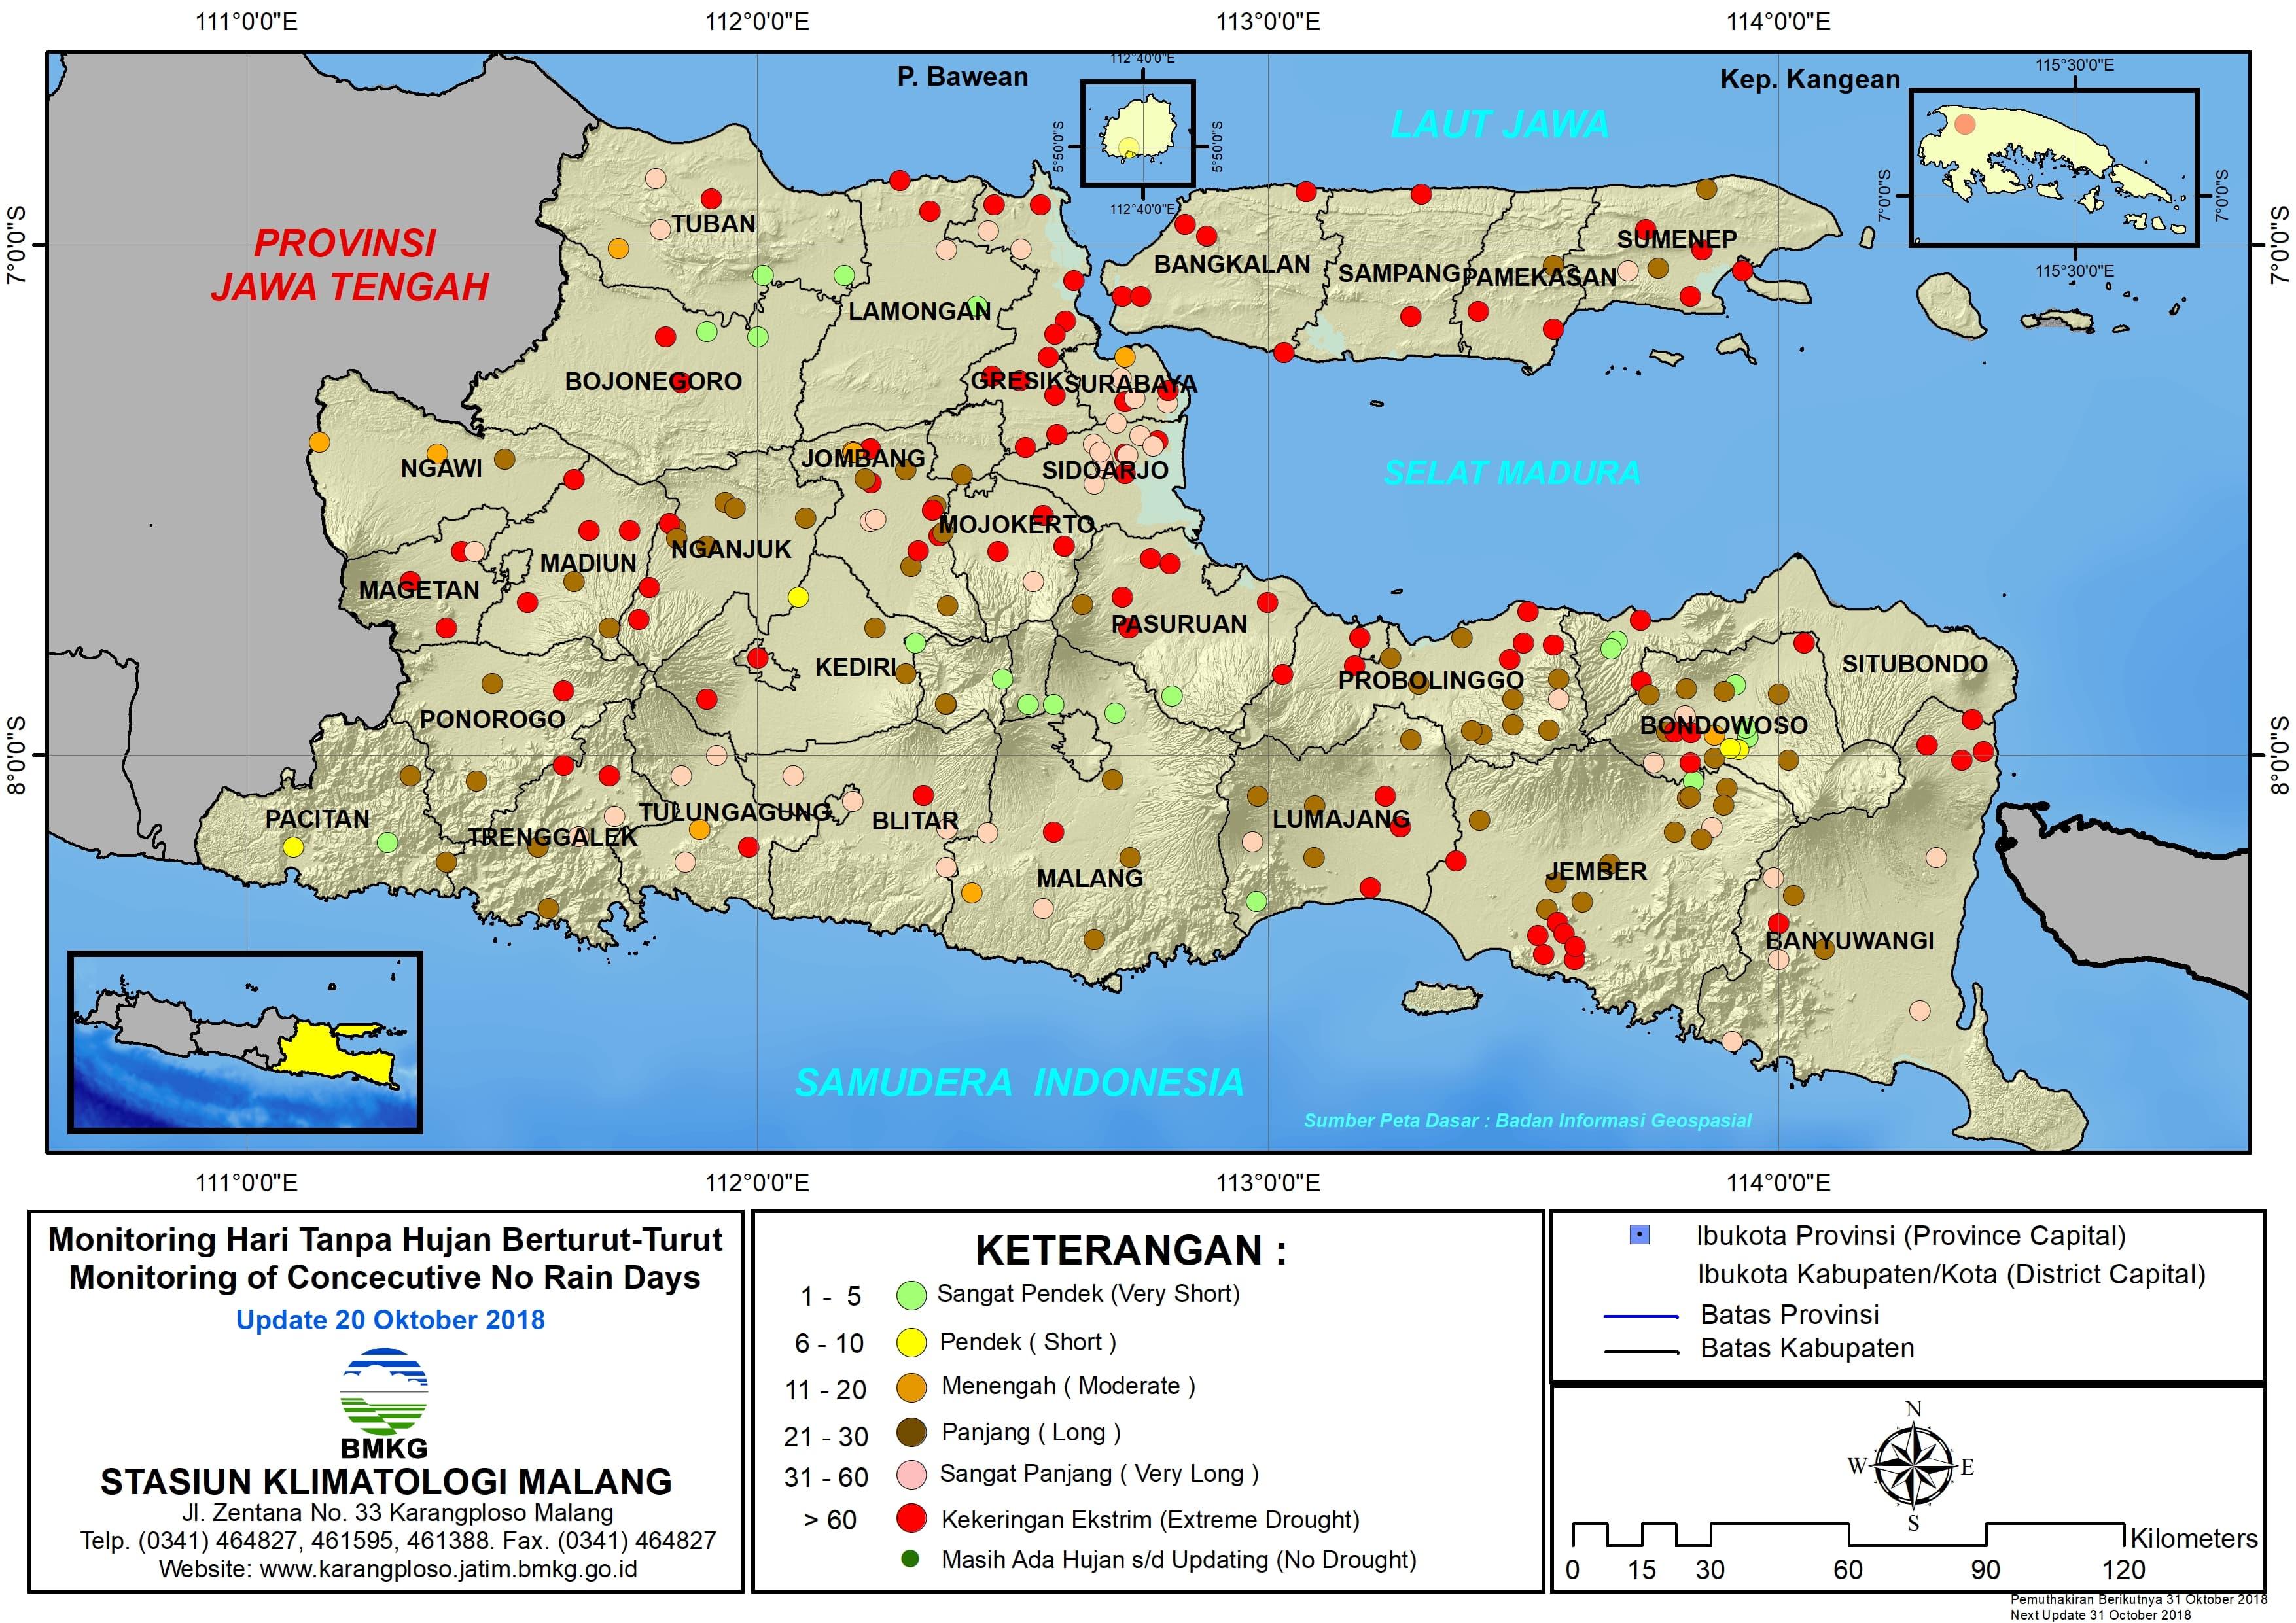 Monitoring Hari Tanpa Hujan Berturut Turut Update 20 Oktober 2018 di Provinsi Jawa Timur